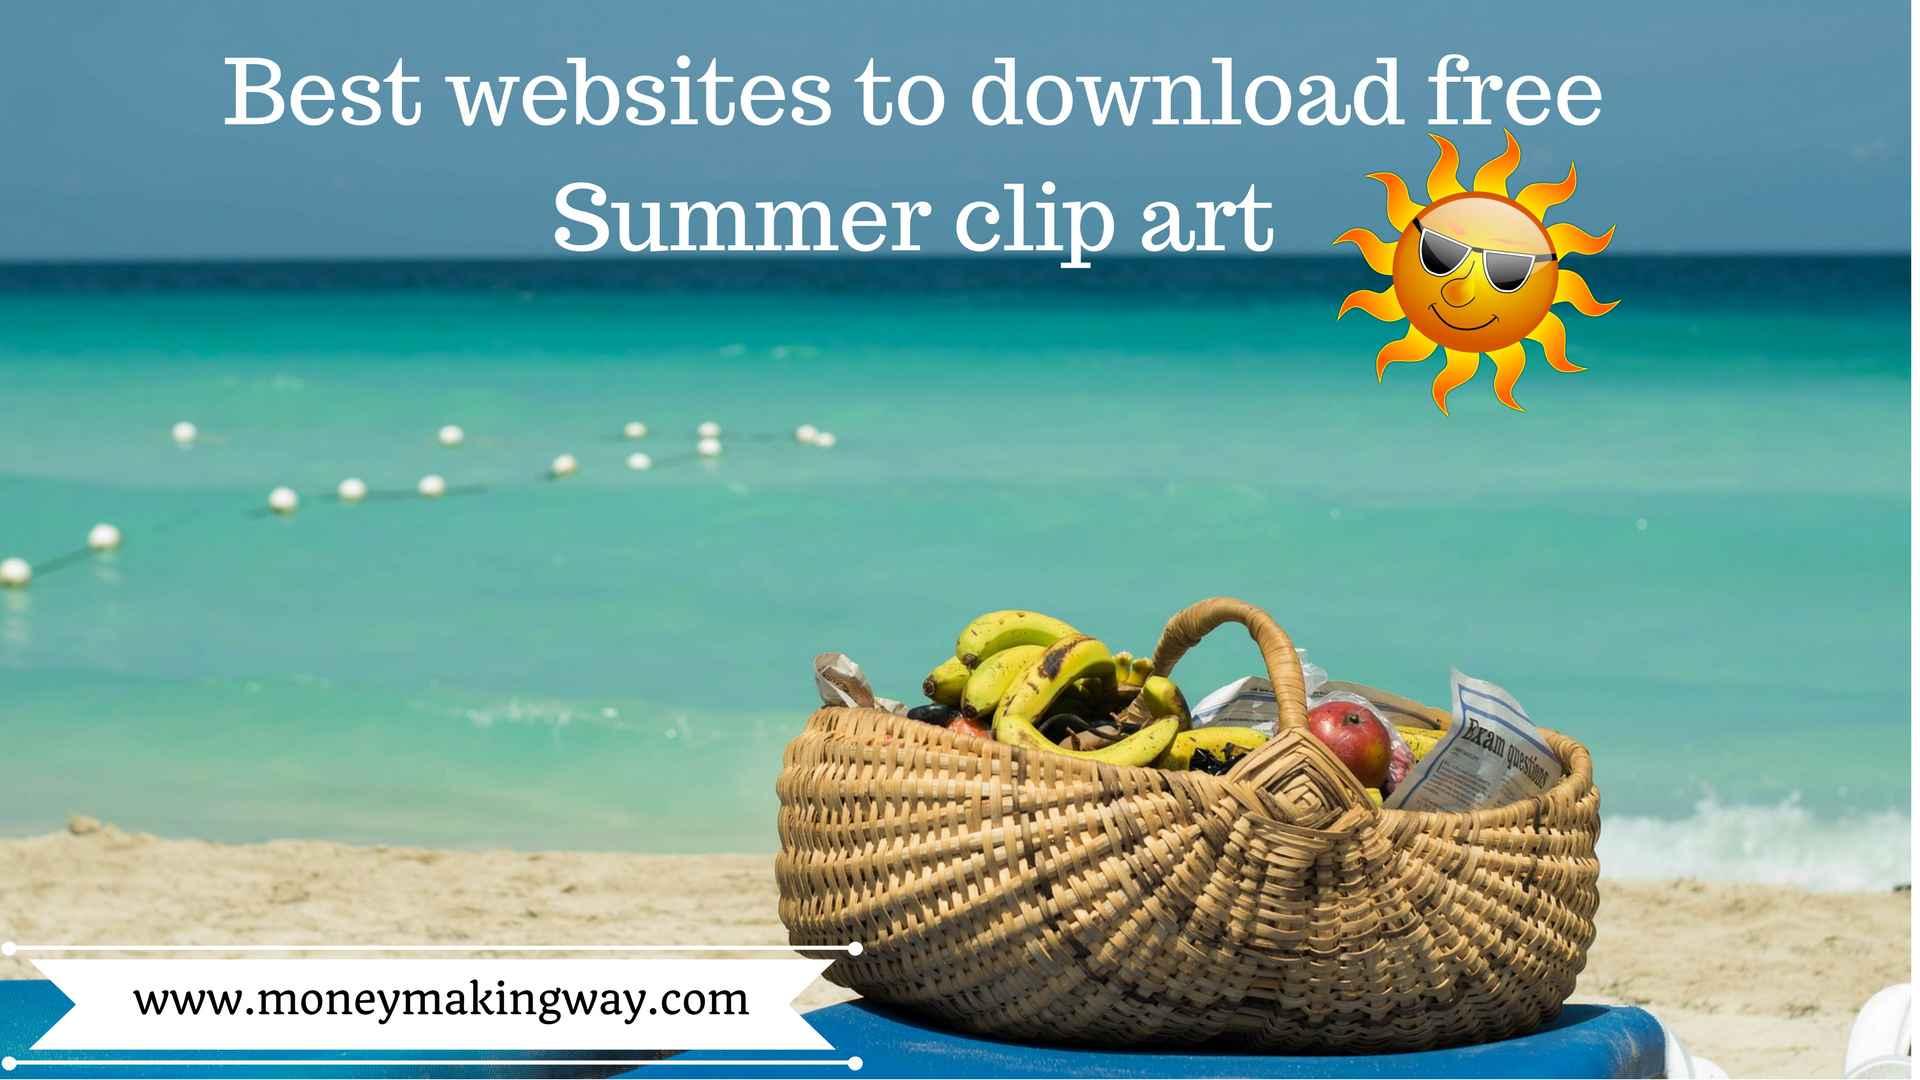 5 Best websites to download free summer clip art.